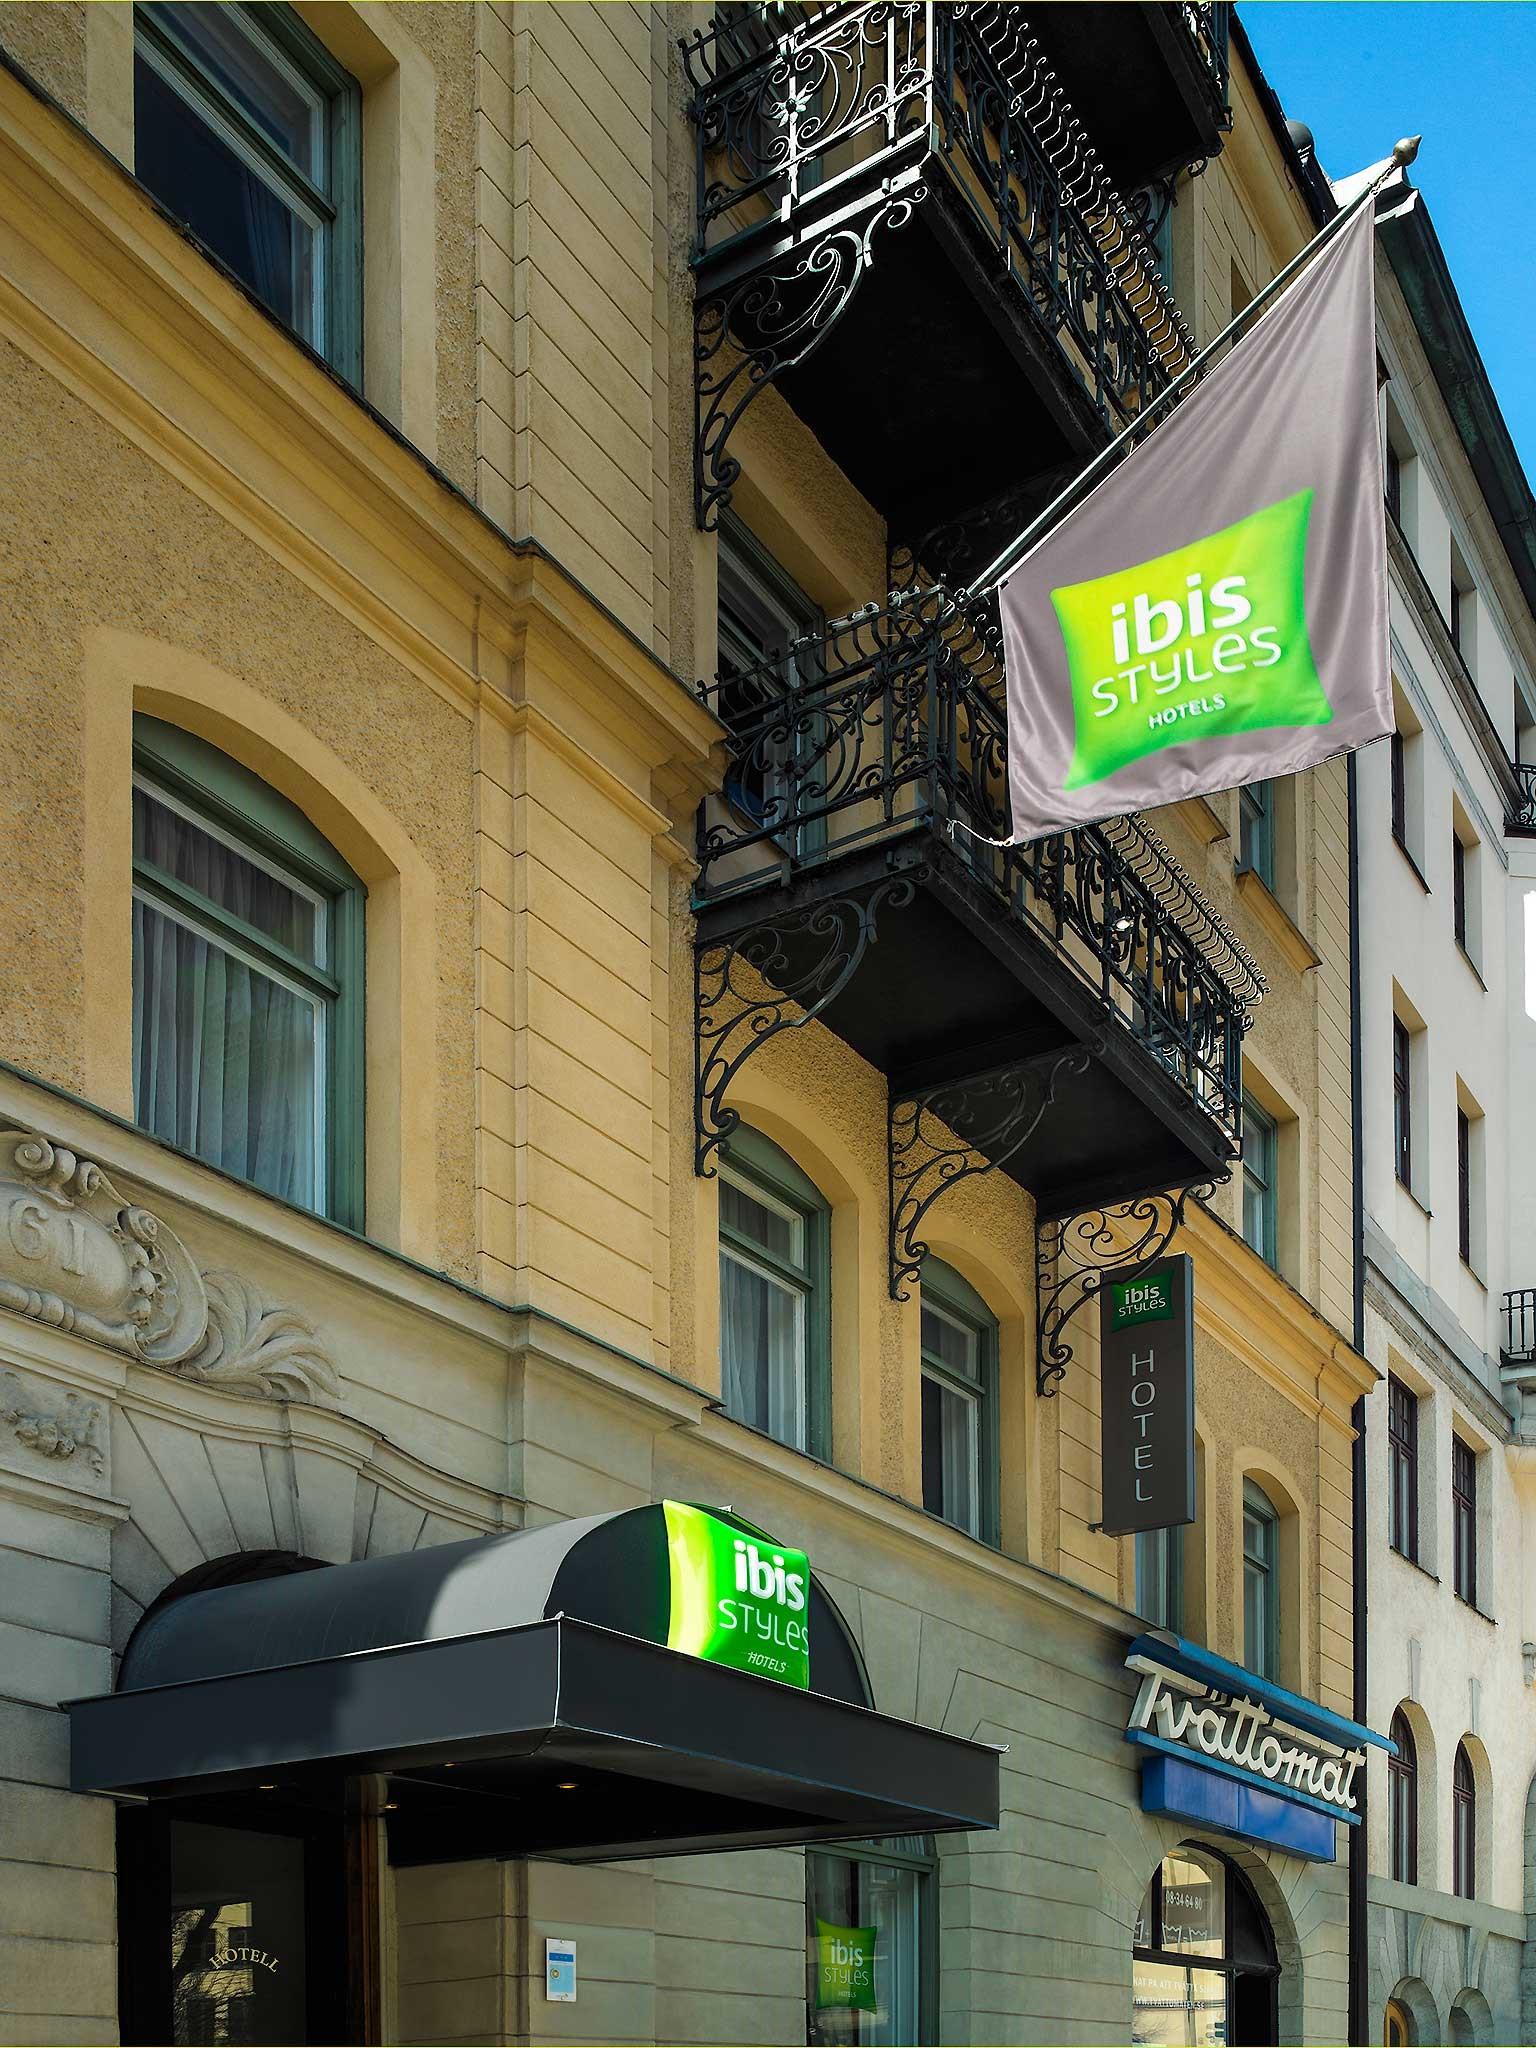 Ibis hotel stockholm